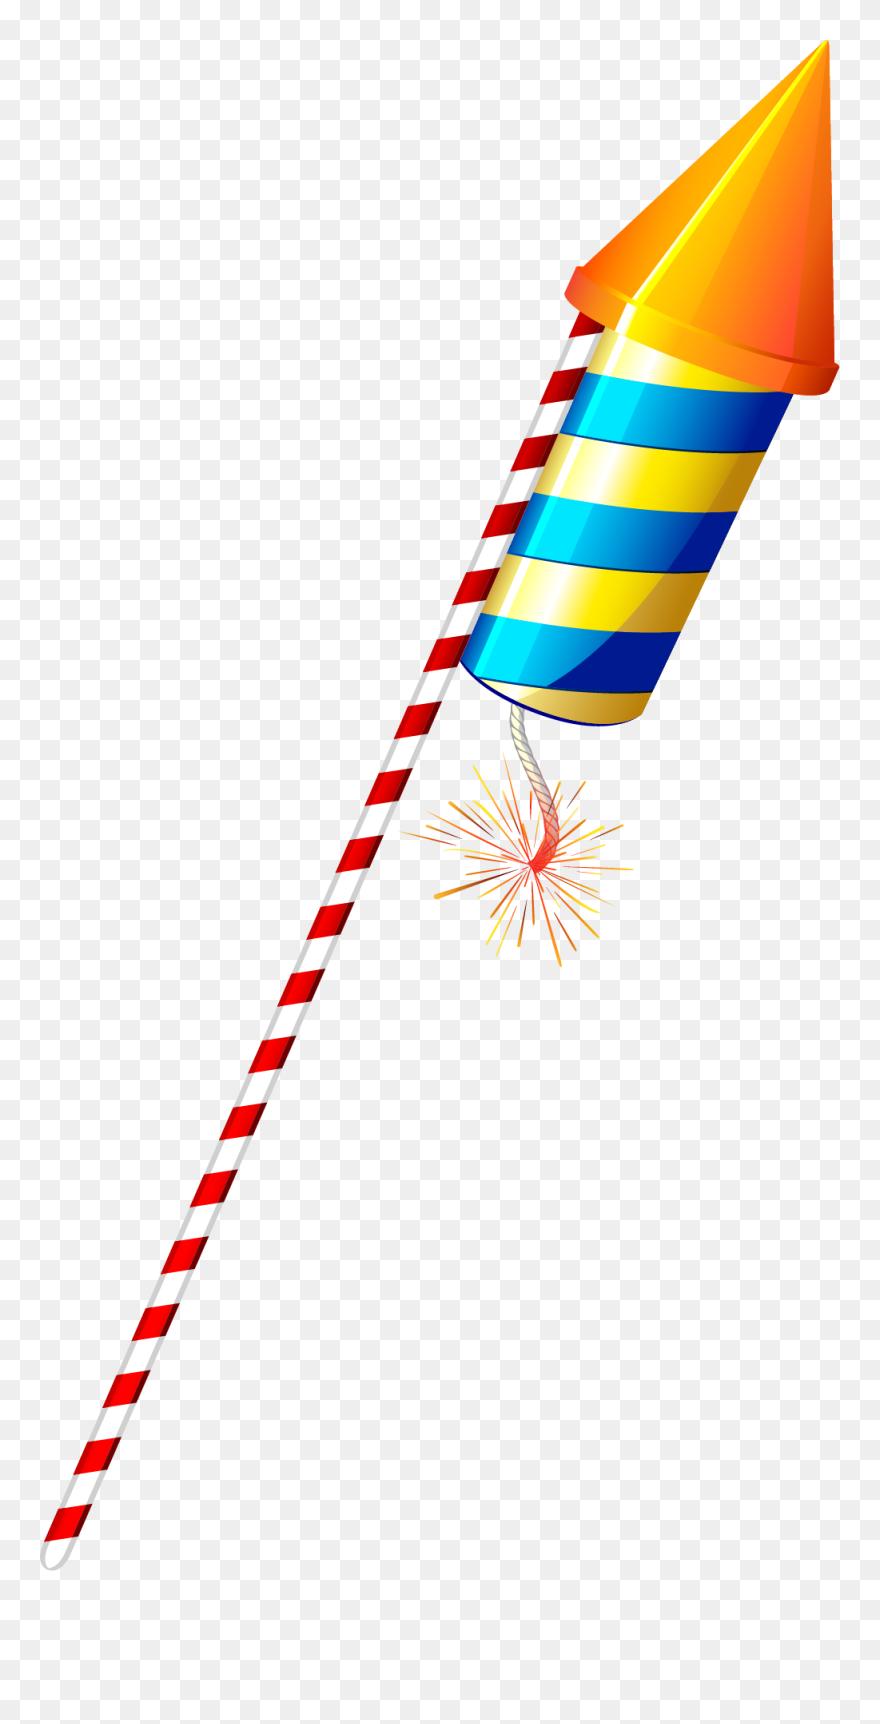 Firework Clipart Diwali Diwali Rocket Png Transparent Png 5213193 Pinclipart